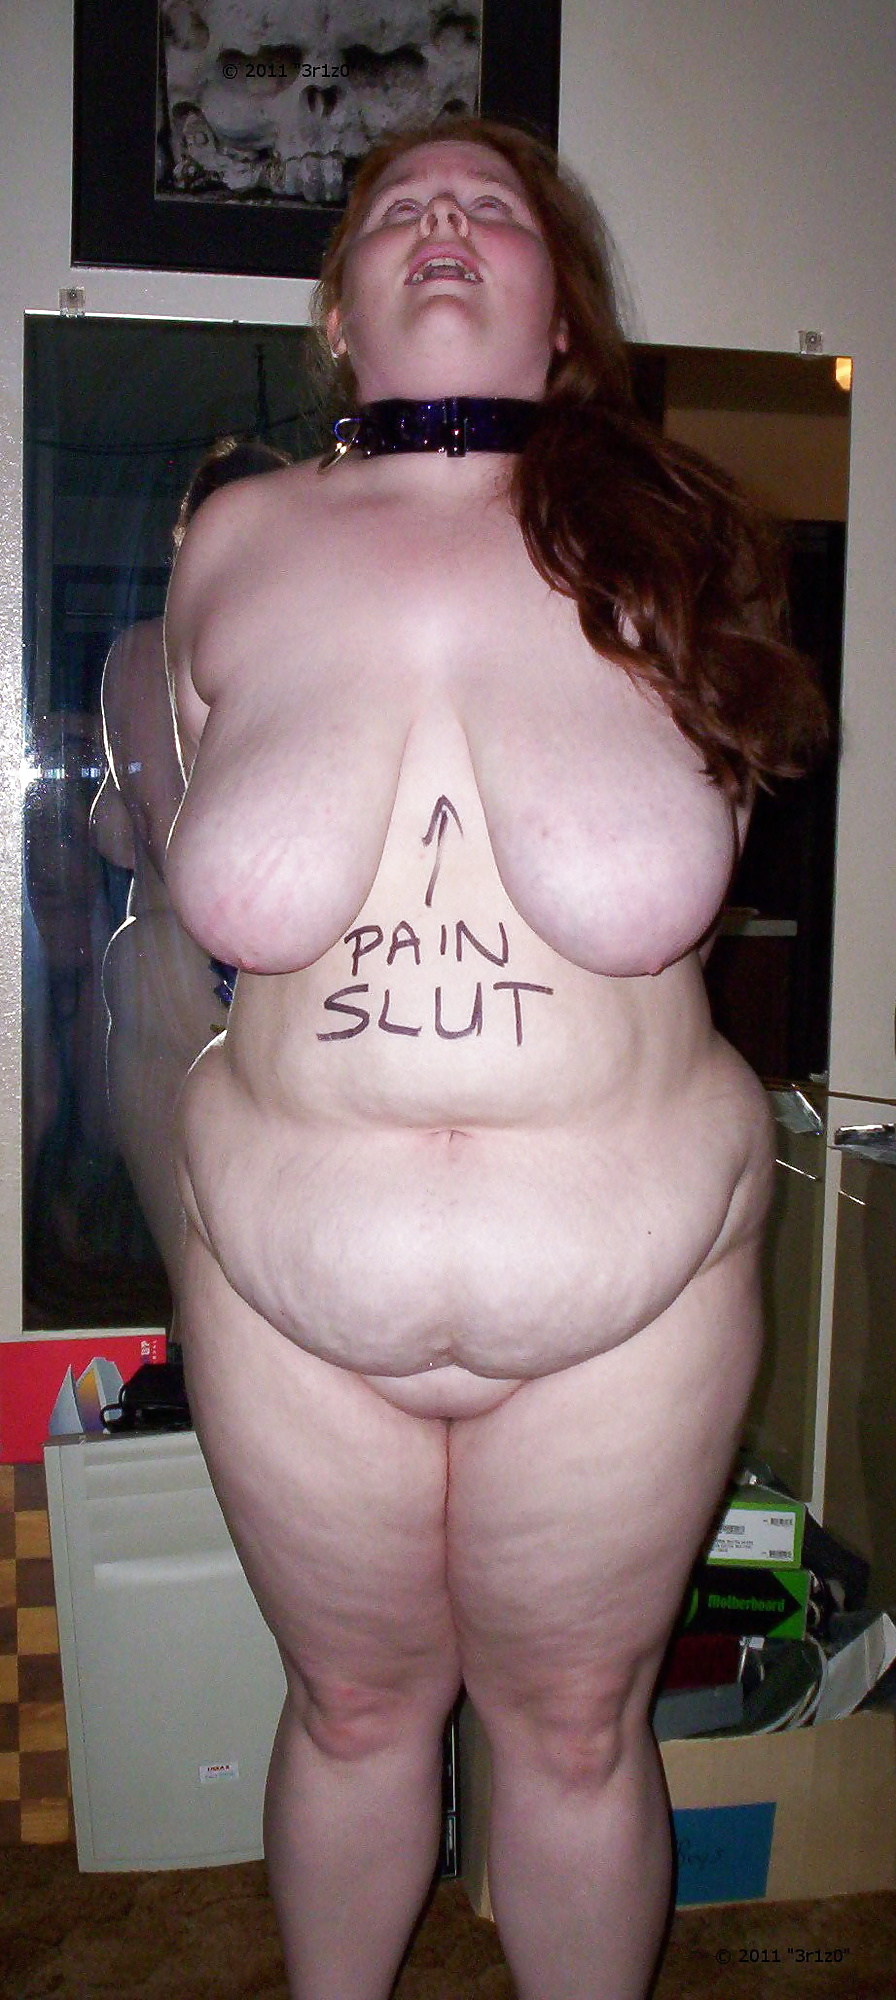 And fingering fat piggy slut